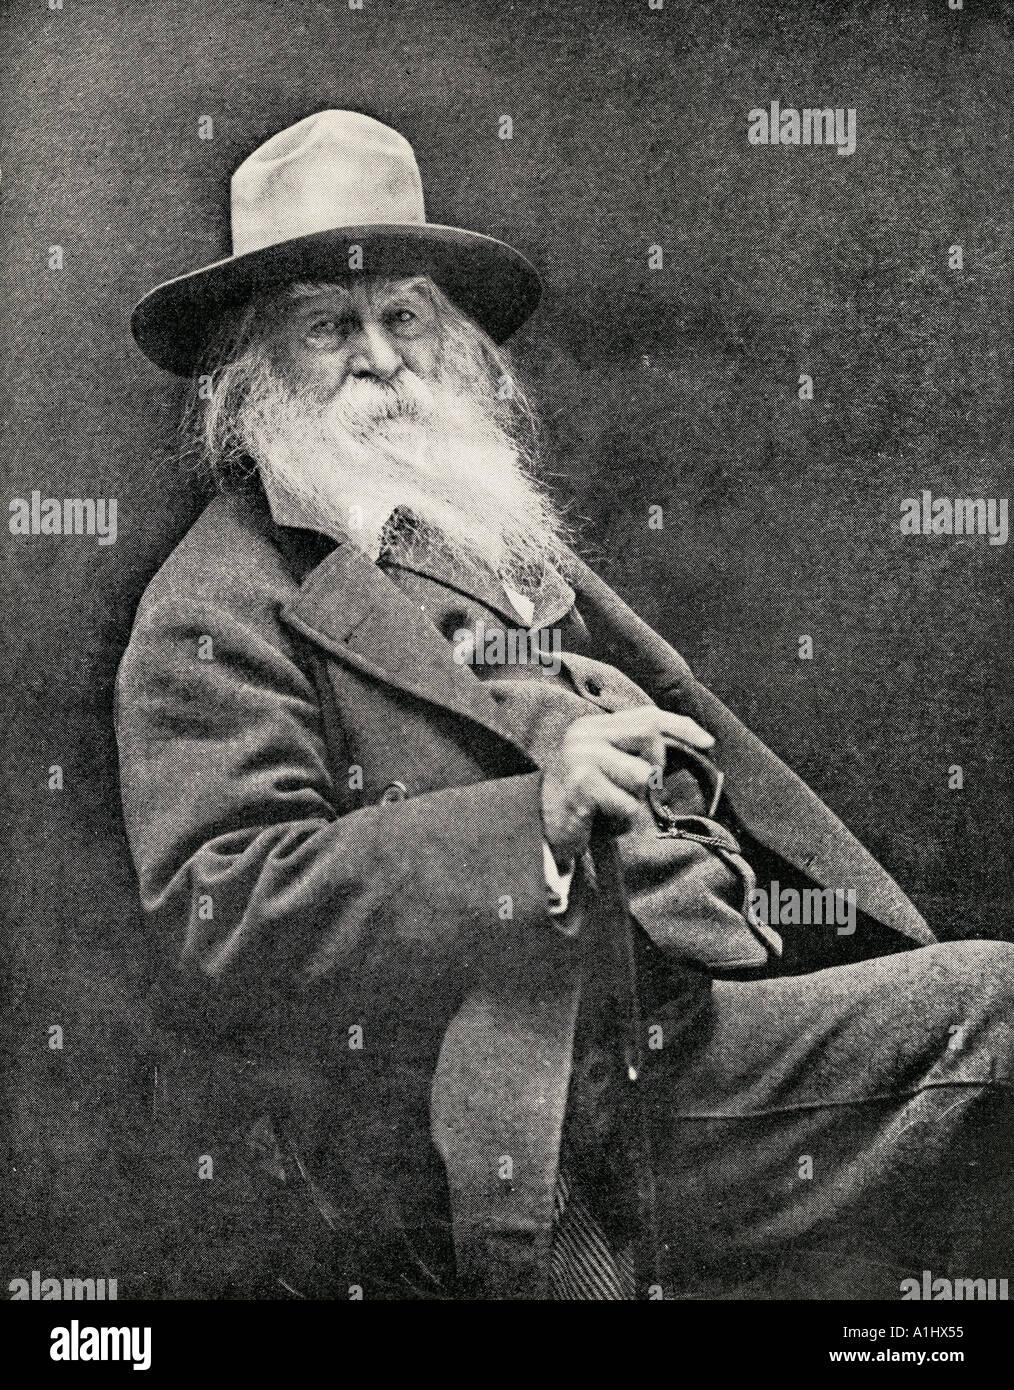 Walt Whitman, 1819 - 1892. Poeta americano Foto Stock